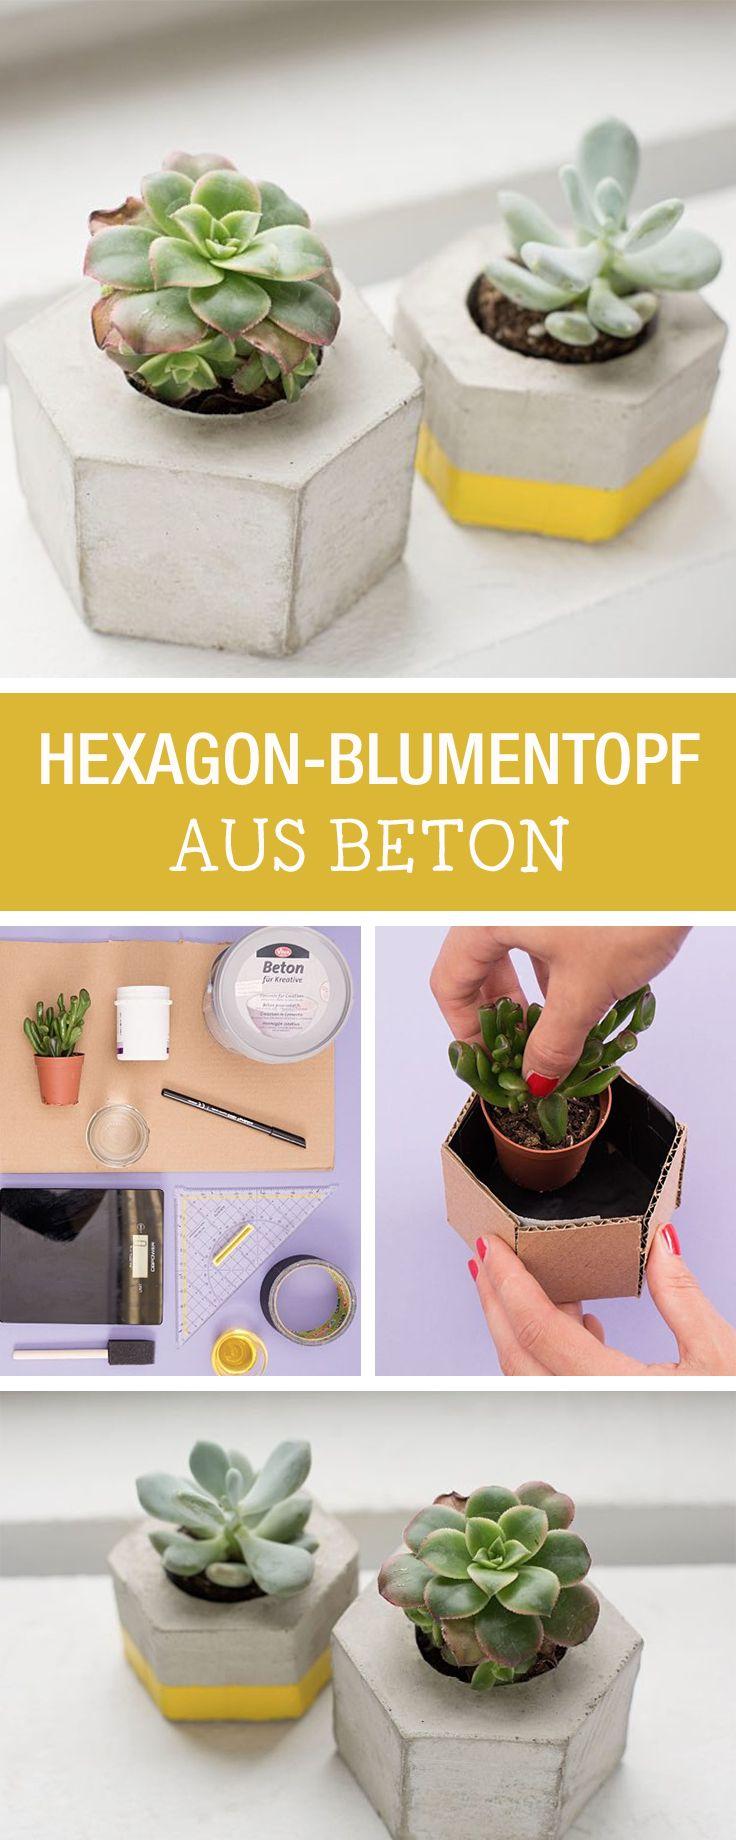 diy-anleitung: hexagon-form für beton-blumentopf selber machen via